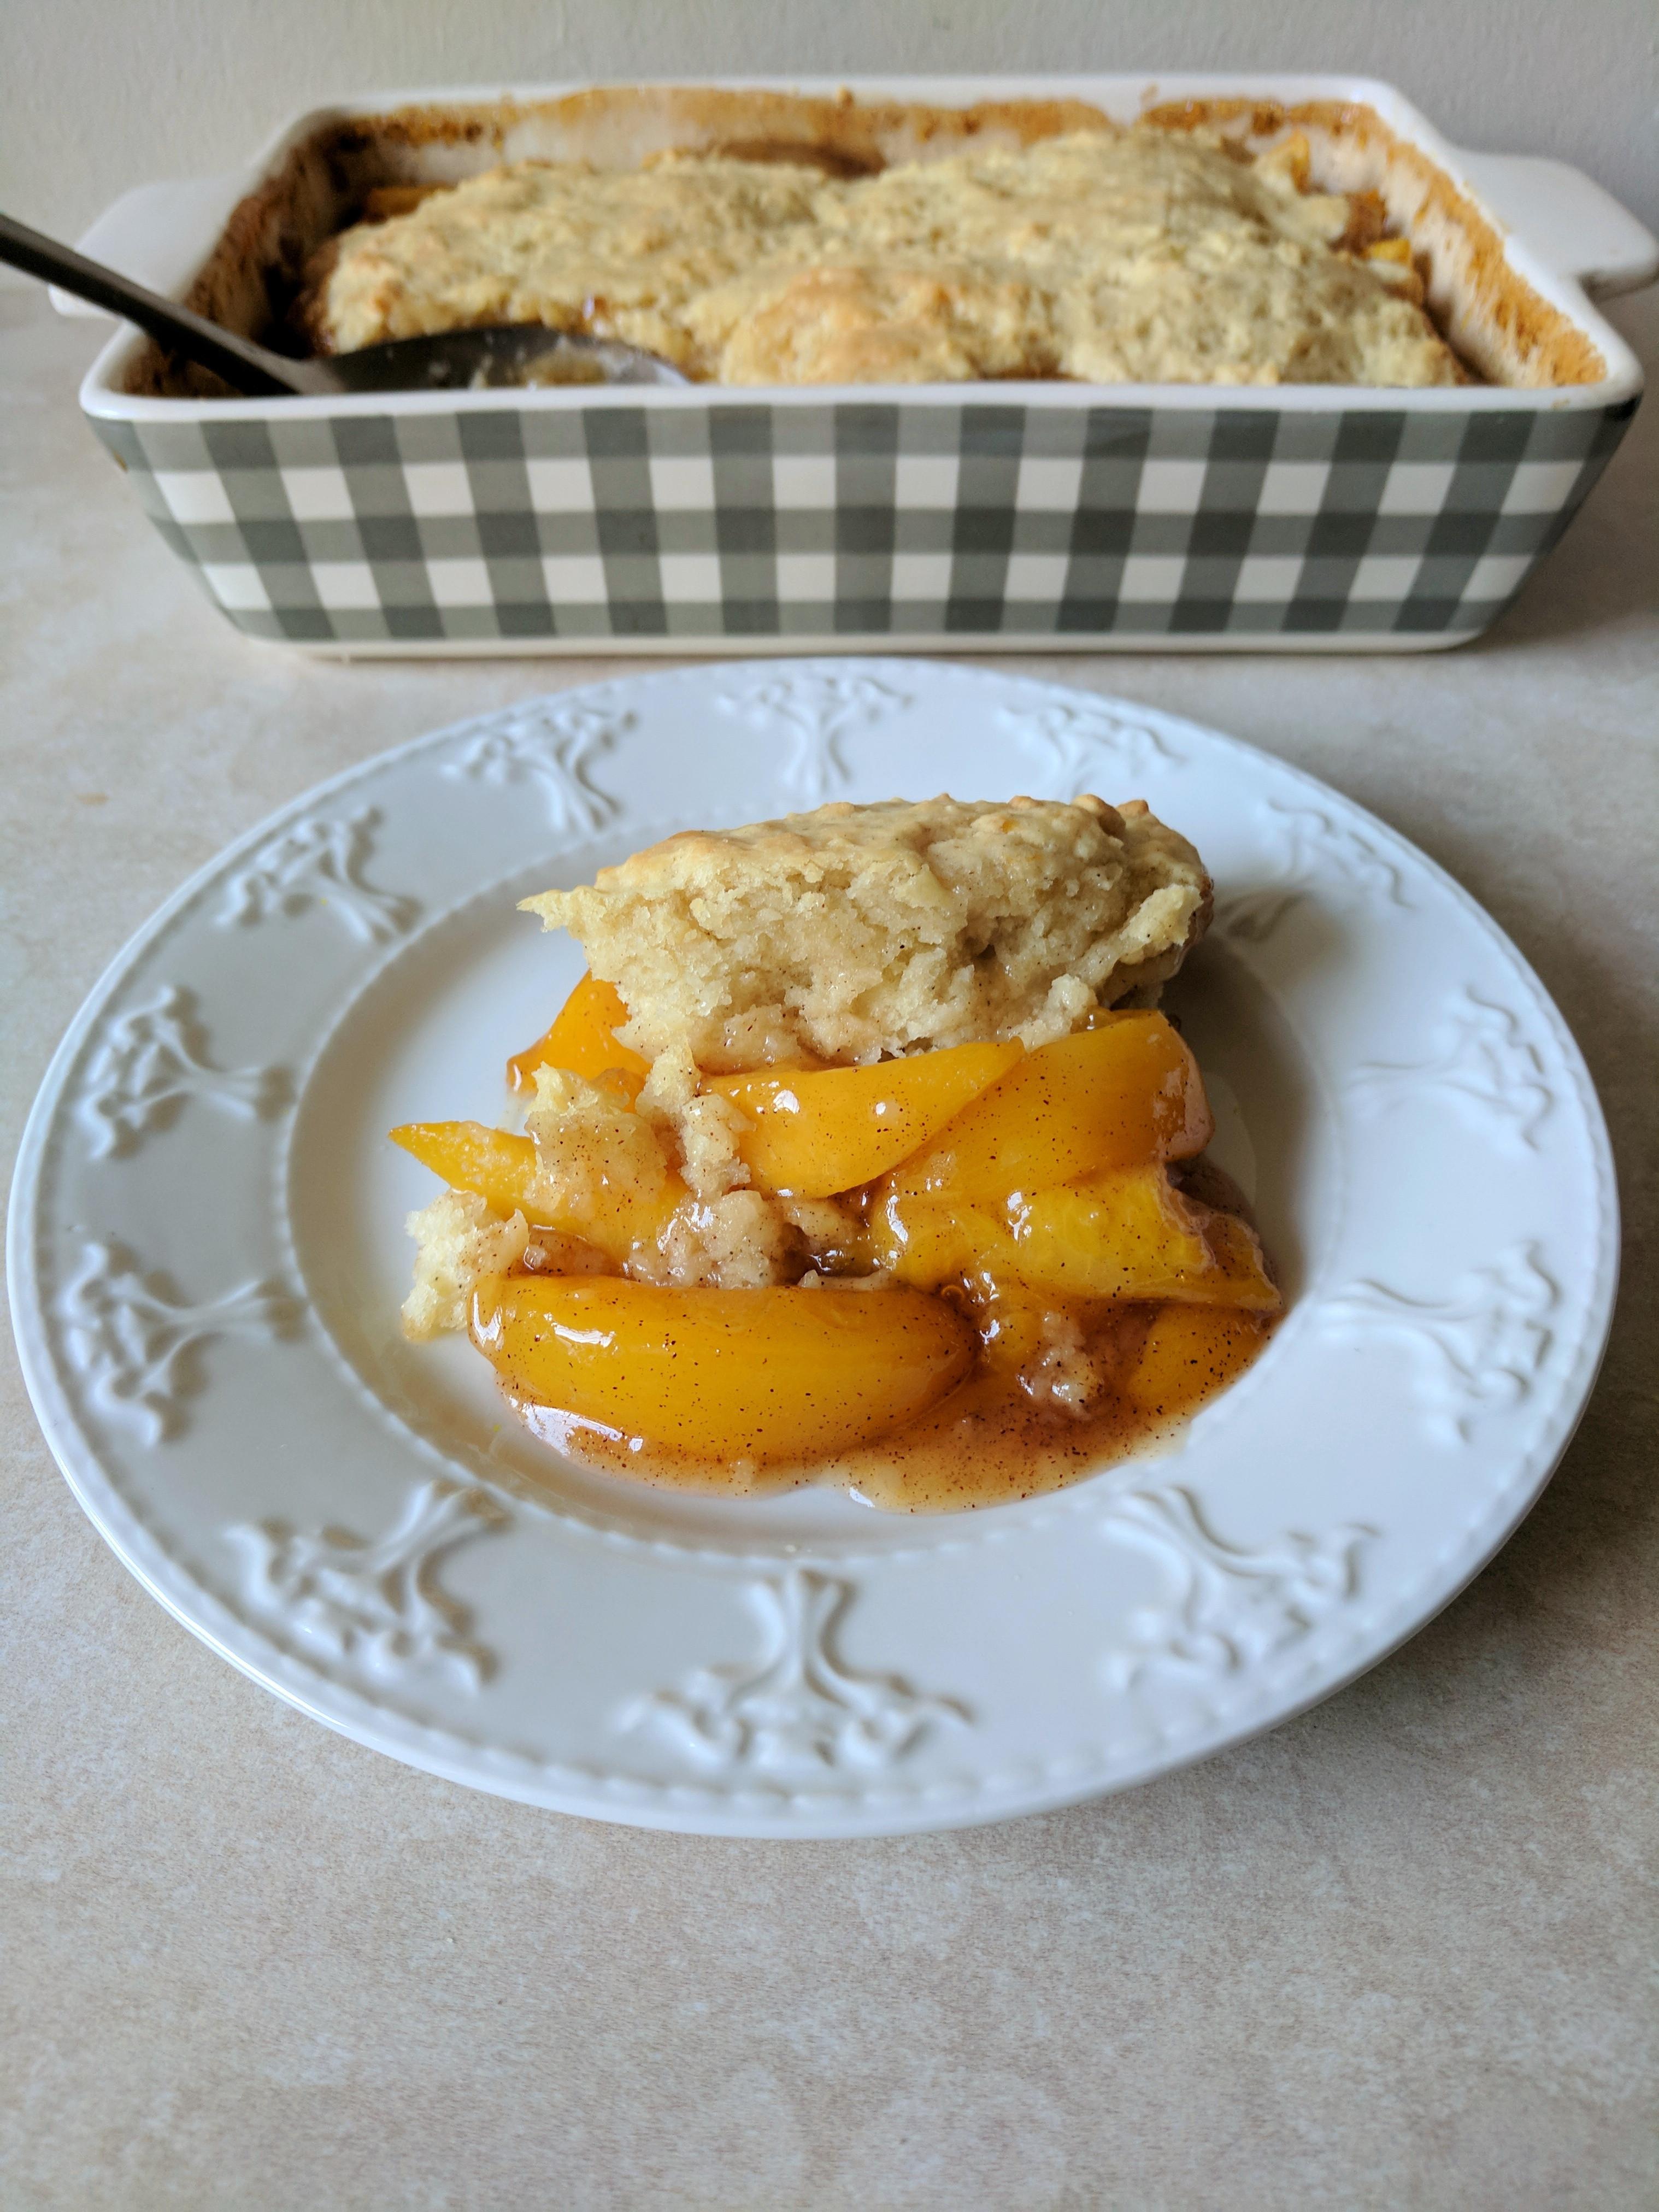 Vegan Peach Cobbler  Vegan Peach Cobbler Vegan And Proud Blog